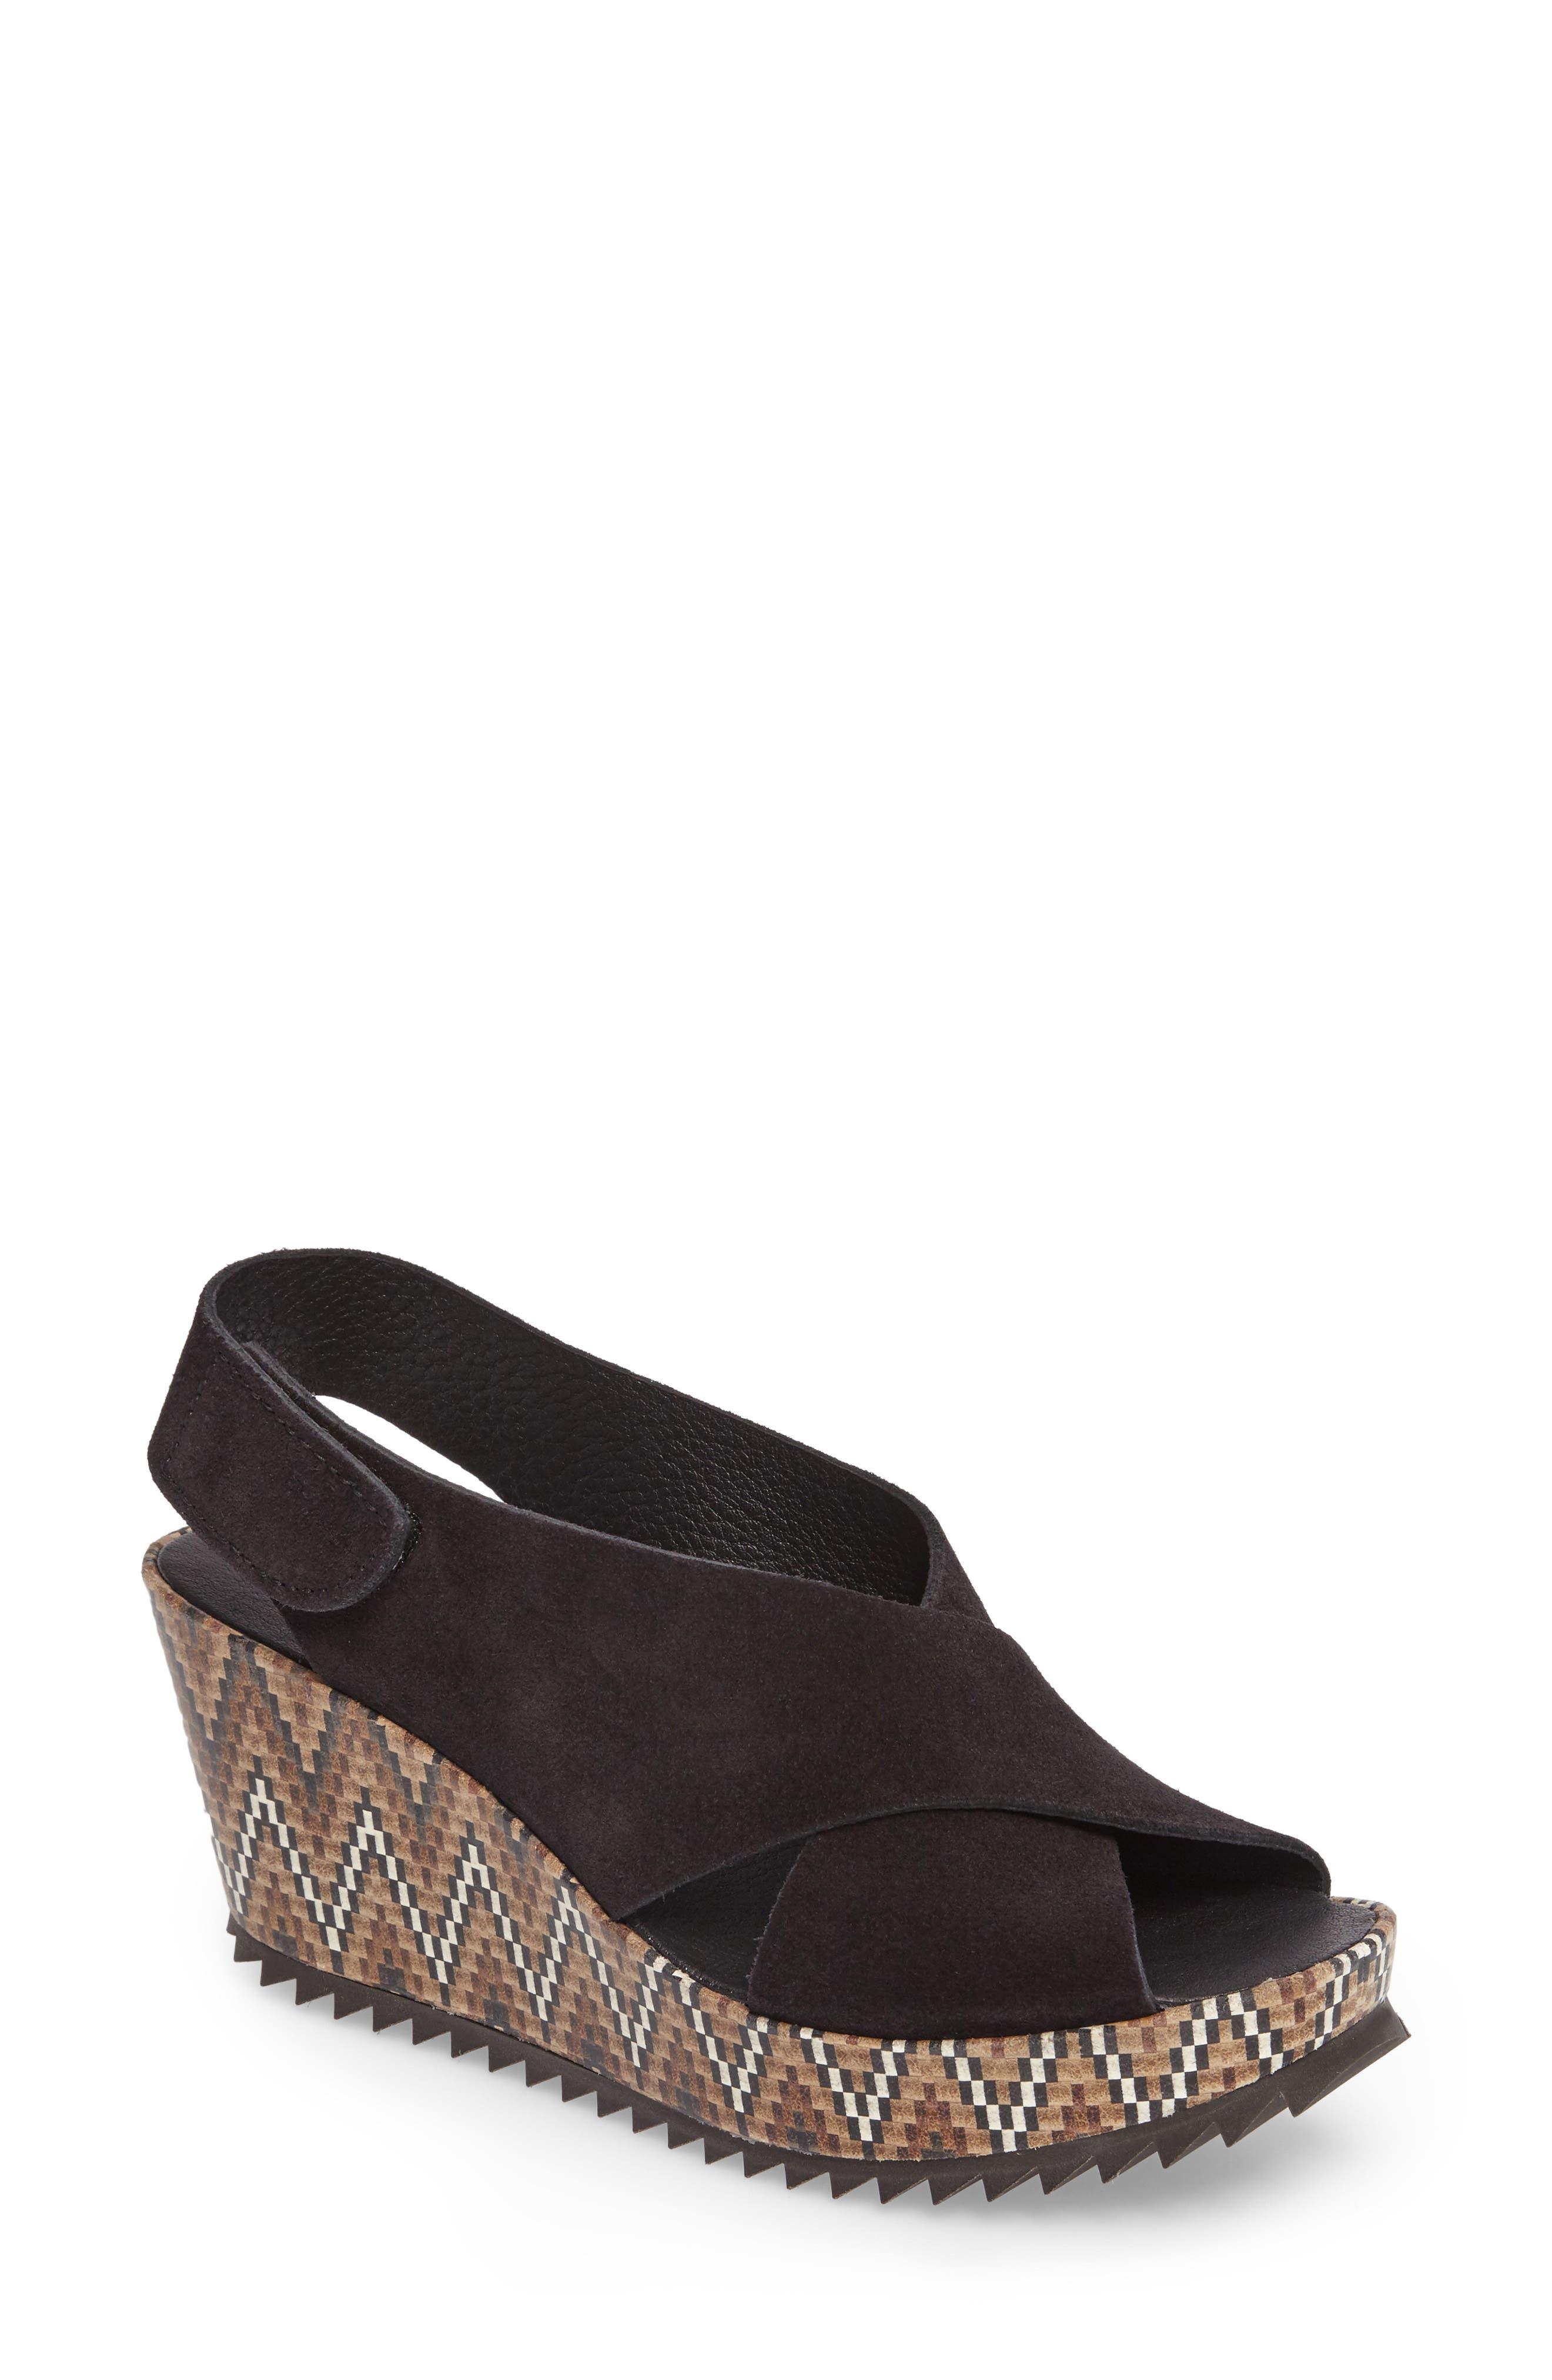 'Federica' Wedge Sandal,                         Main,                         color,